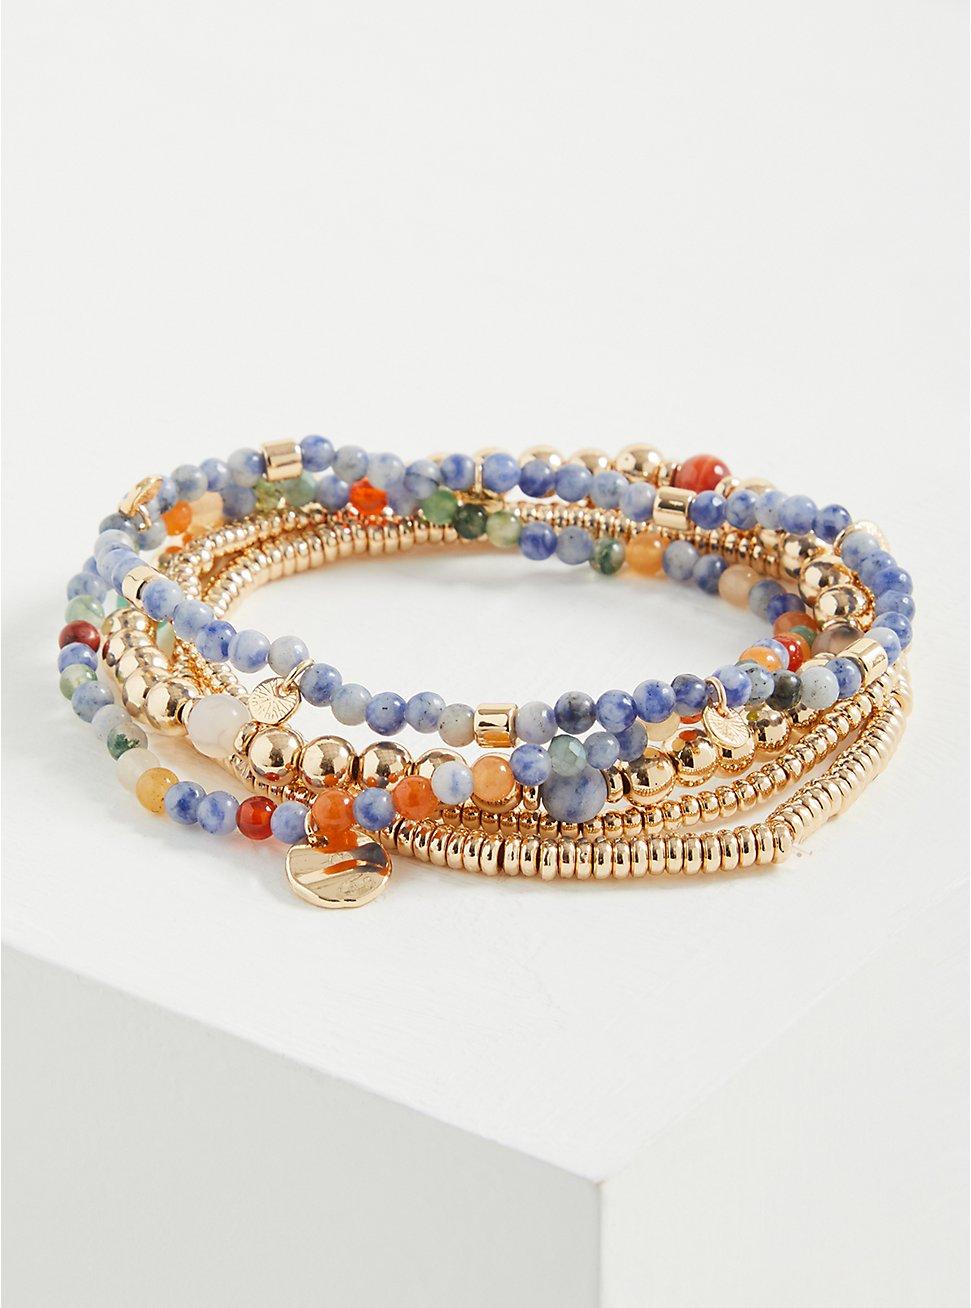 Beaded Stretch Bracelet Set of 5 - Gold Tone & Blue Stone, GOLD, hi-res